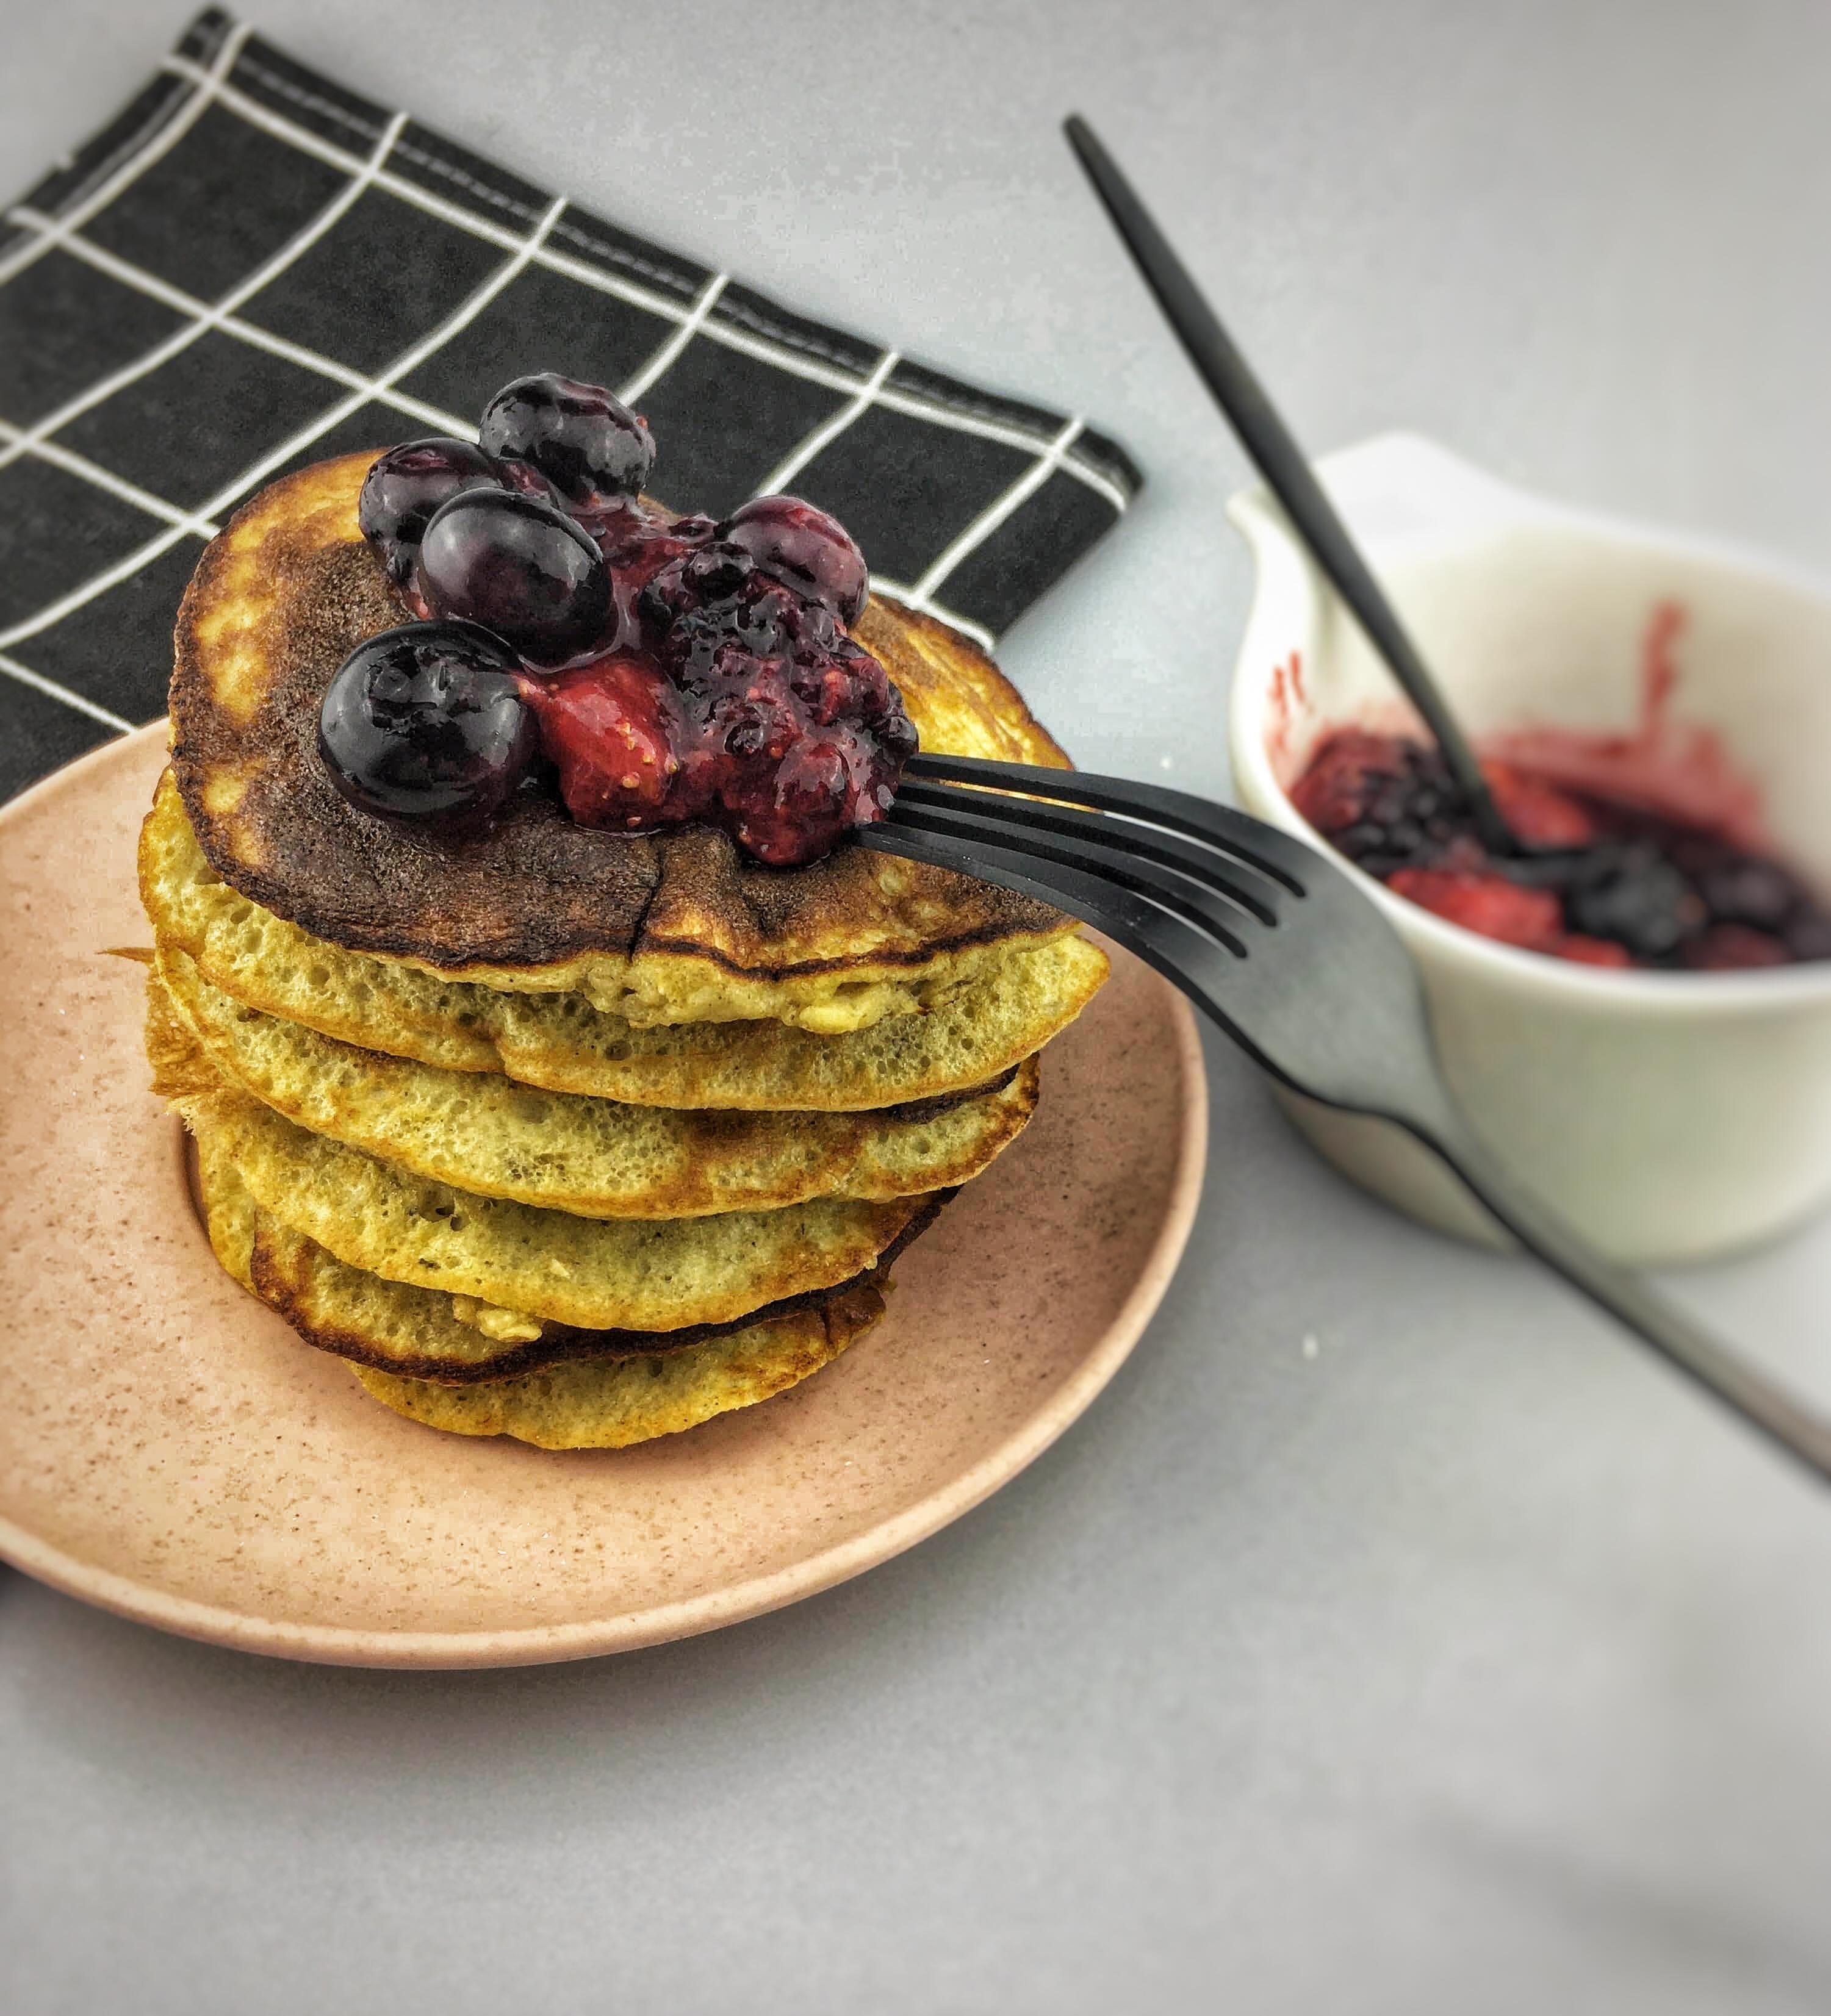 Banana pancakes with red fruit, Banana pancakes, Blender banana pancakes, Perfect banana pancakes, Banana pancakes recipe, Best banana pancakes, Healthy banana pancakes, Banana pancakes oatmeal, Tasty pancakes banana, Banana pancakes healthy, Organic Happiness, Organic, Organic Food blog